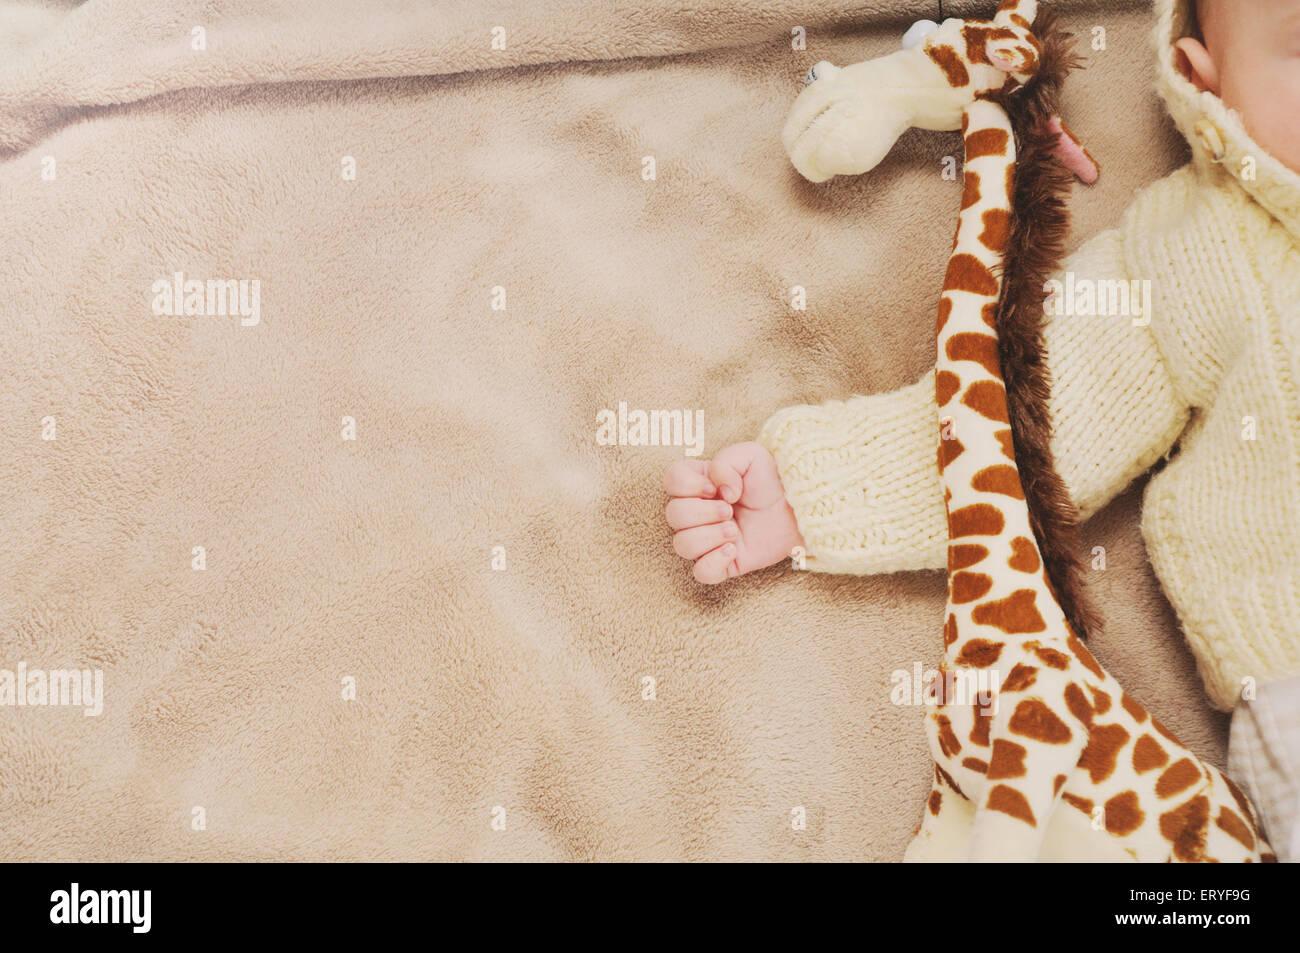 sleeping cute newborn baby, maternity concept, soft image of beautiful family - Stock Image